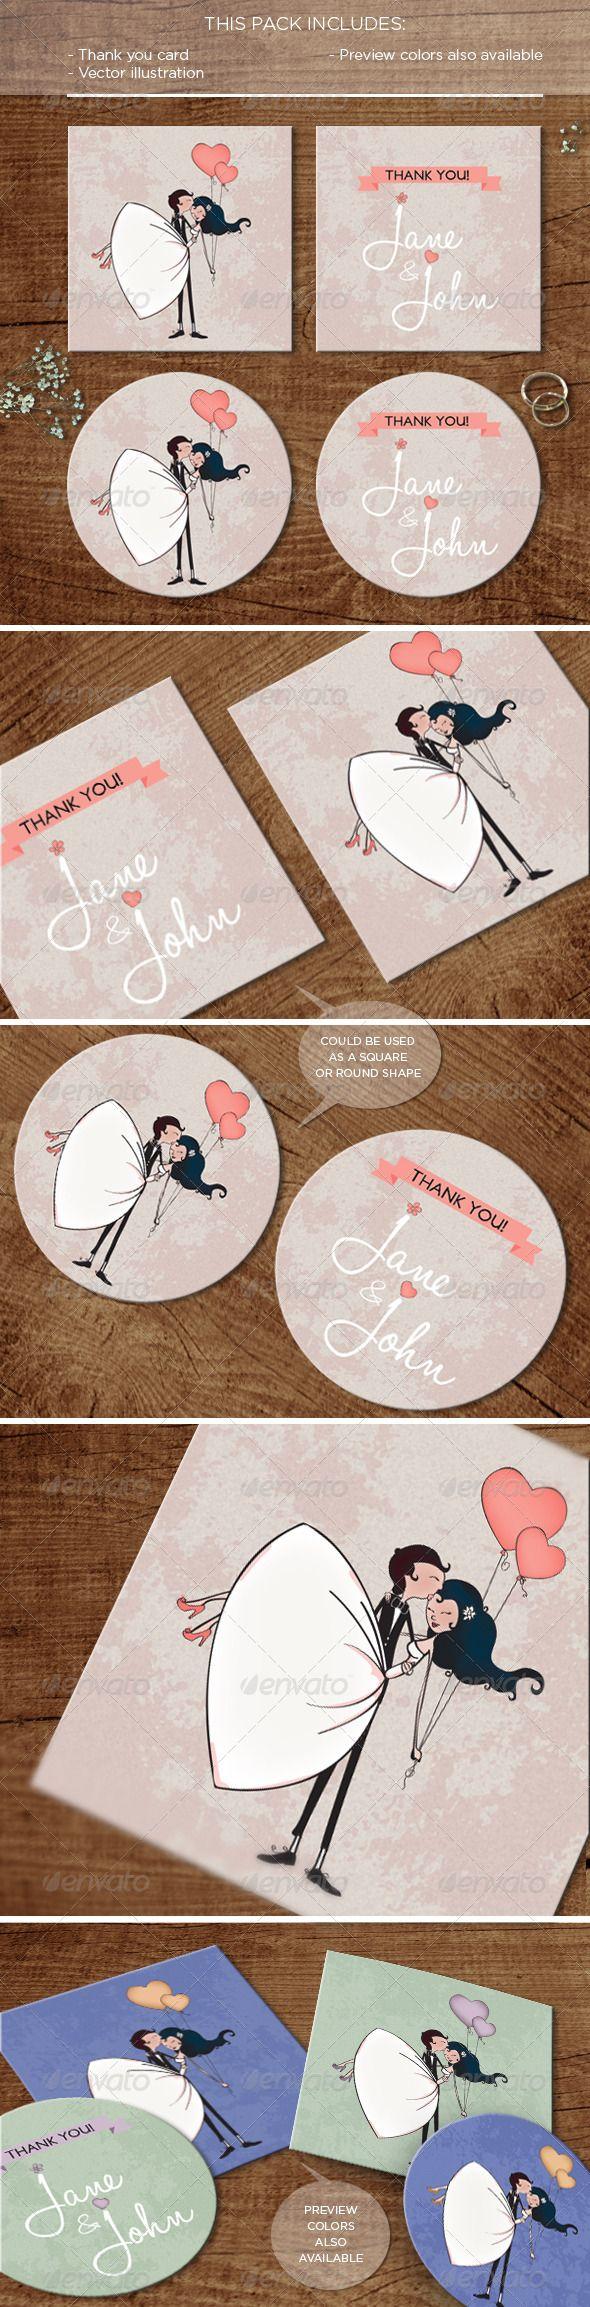 In the Air: #wedding #Thankyou #Card